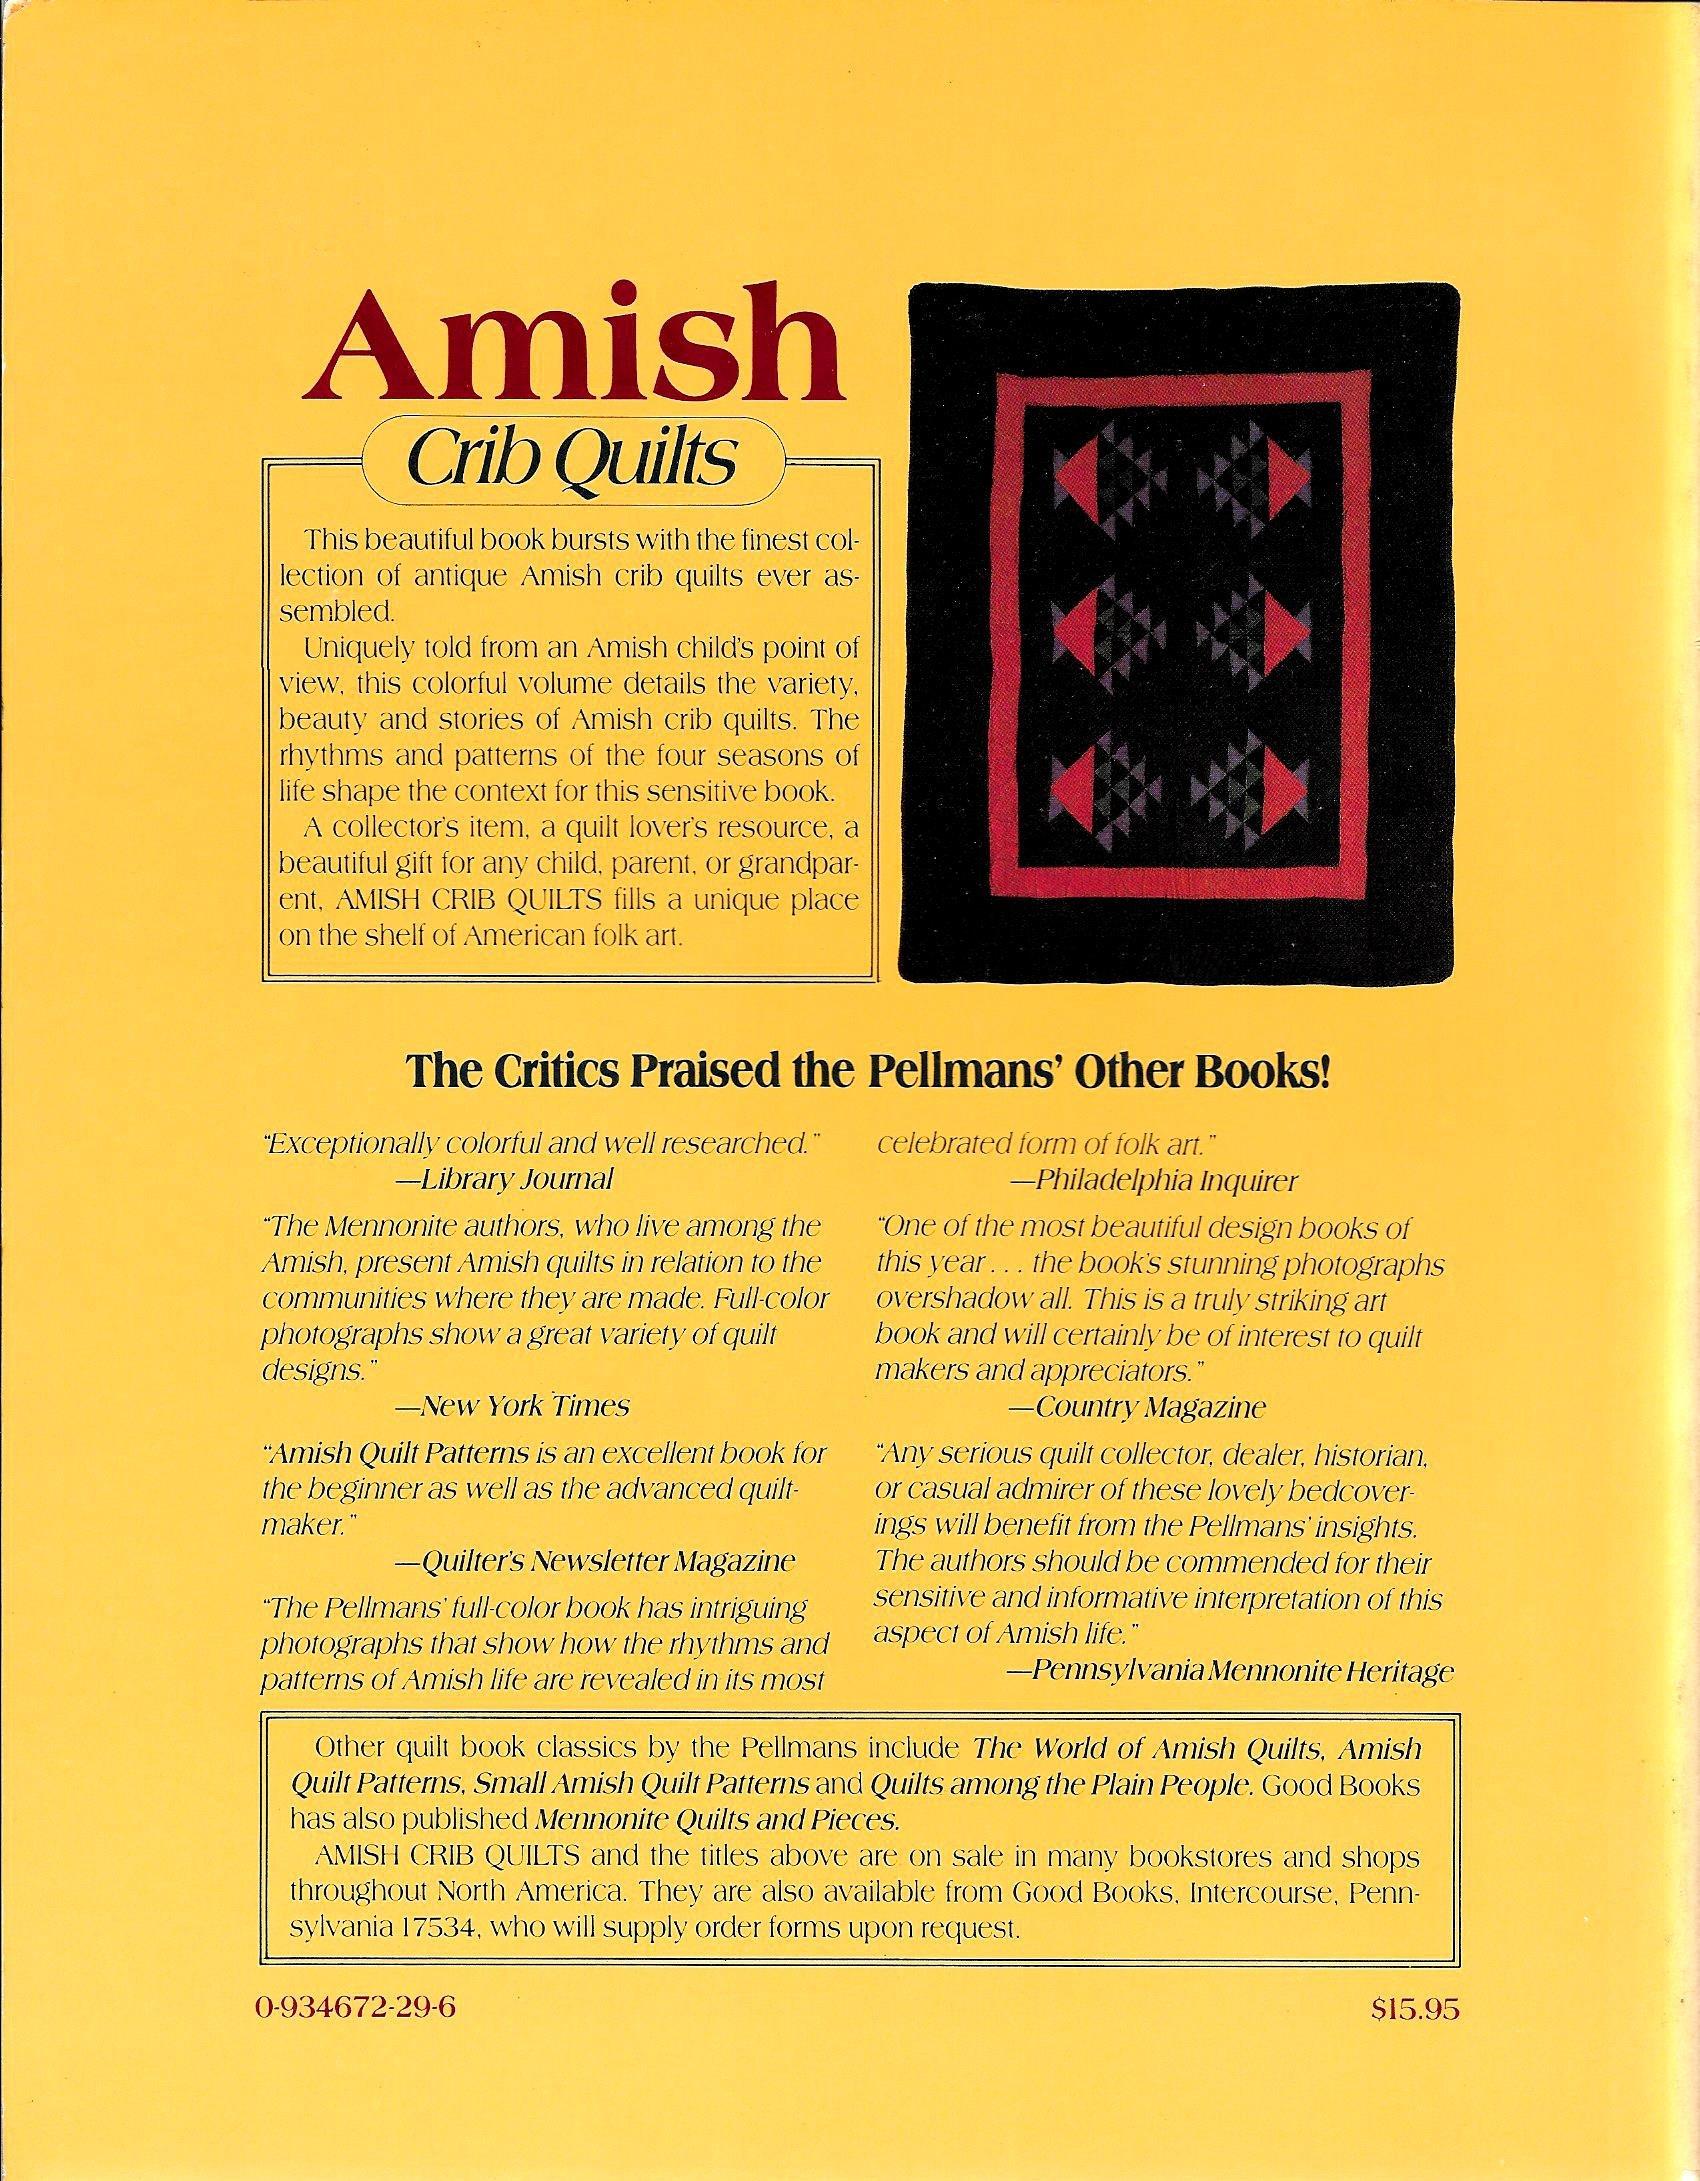 Amish crib for sale - Amish Crib For Sale 12